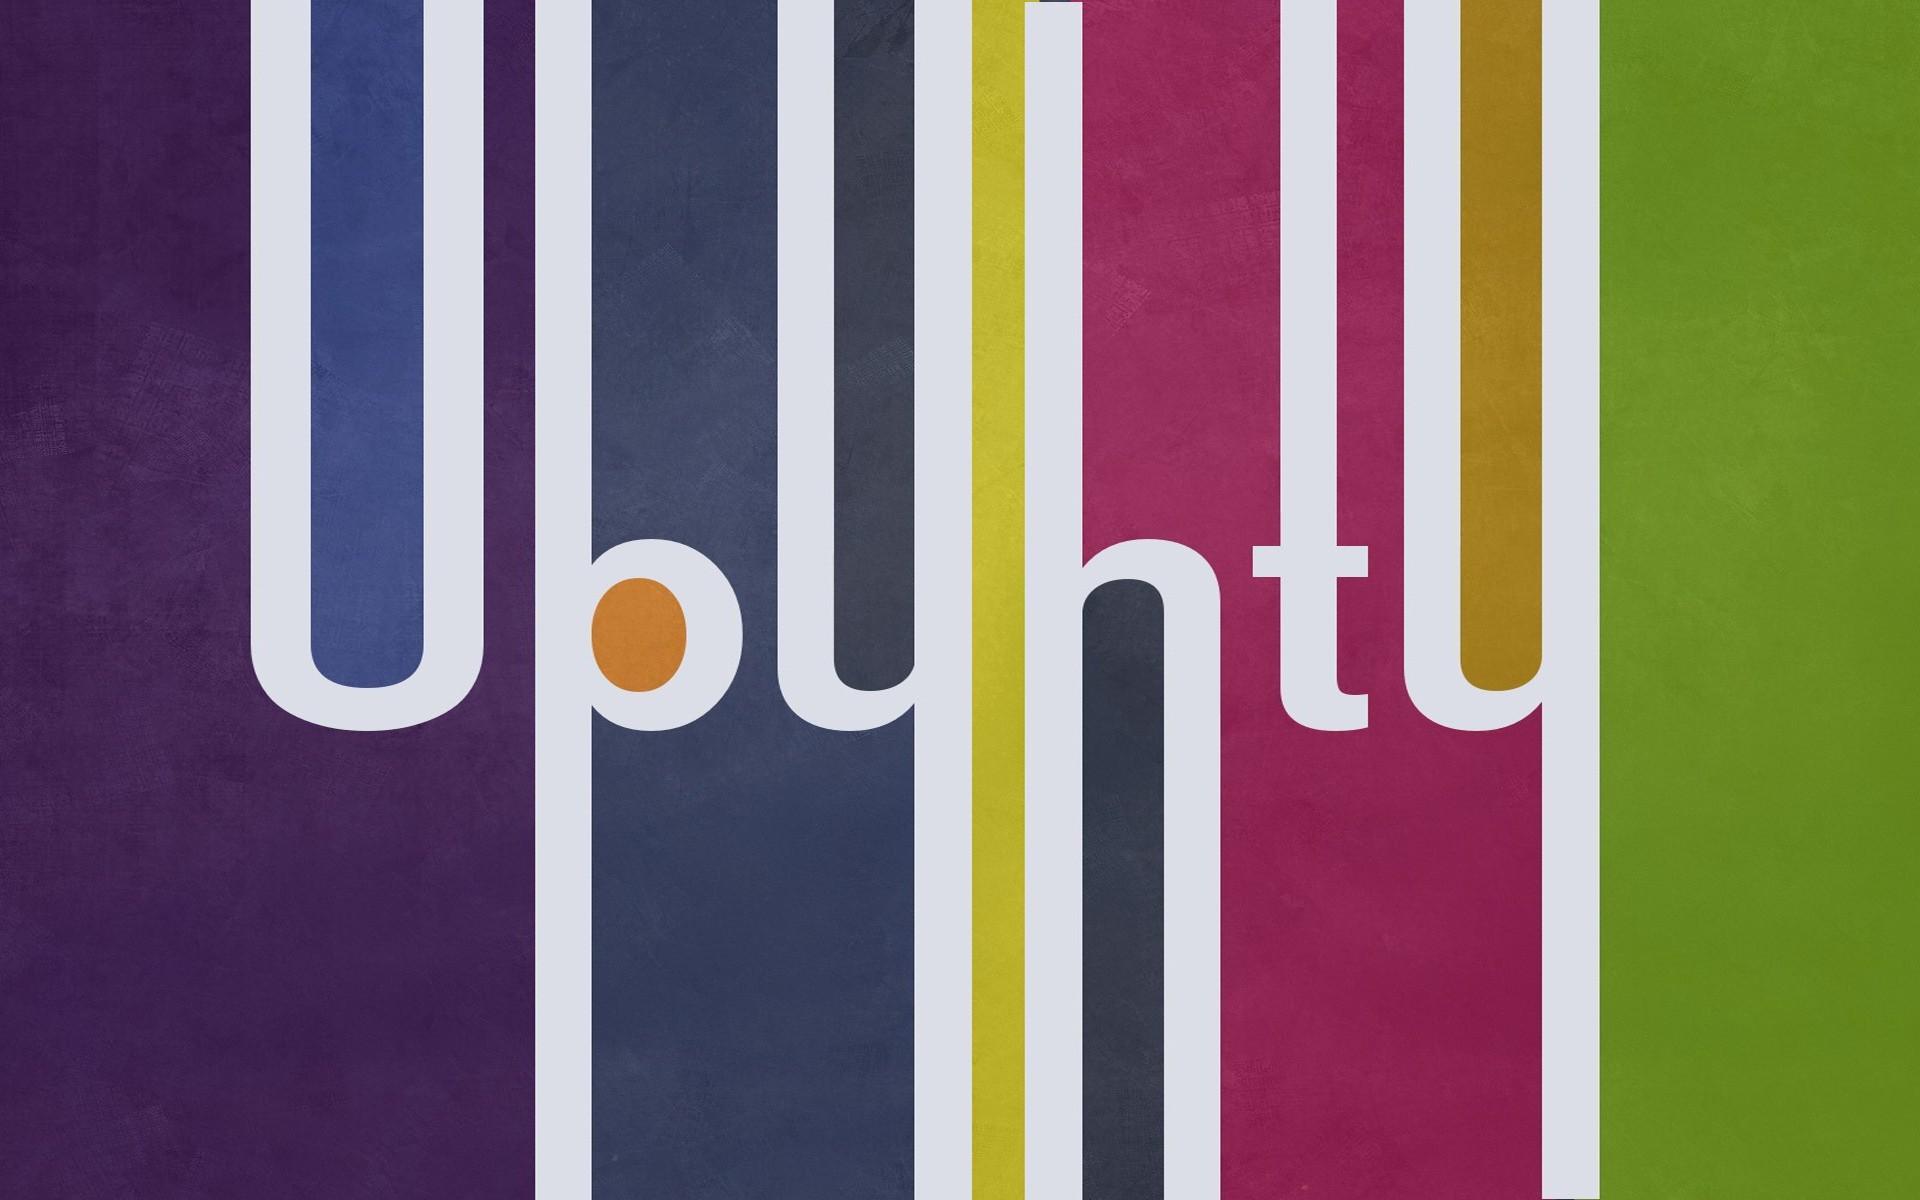 Ubuntu Multicolor - 1920x1200